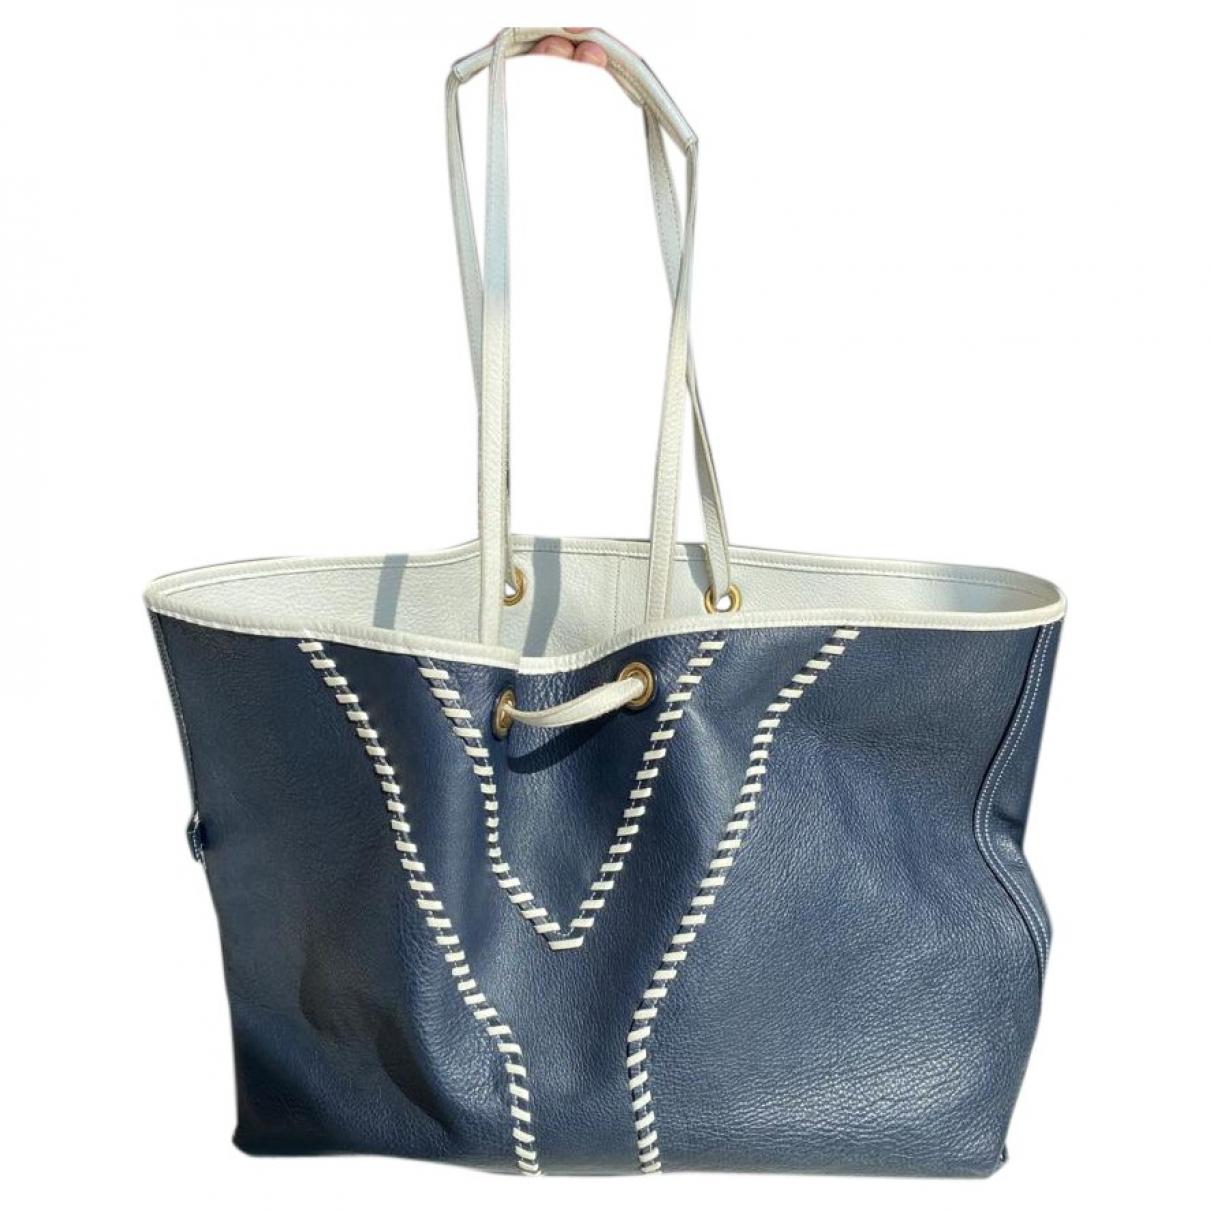 Yves Saint Laurent - Sac a main Easy pour femme en cuir - bleu